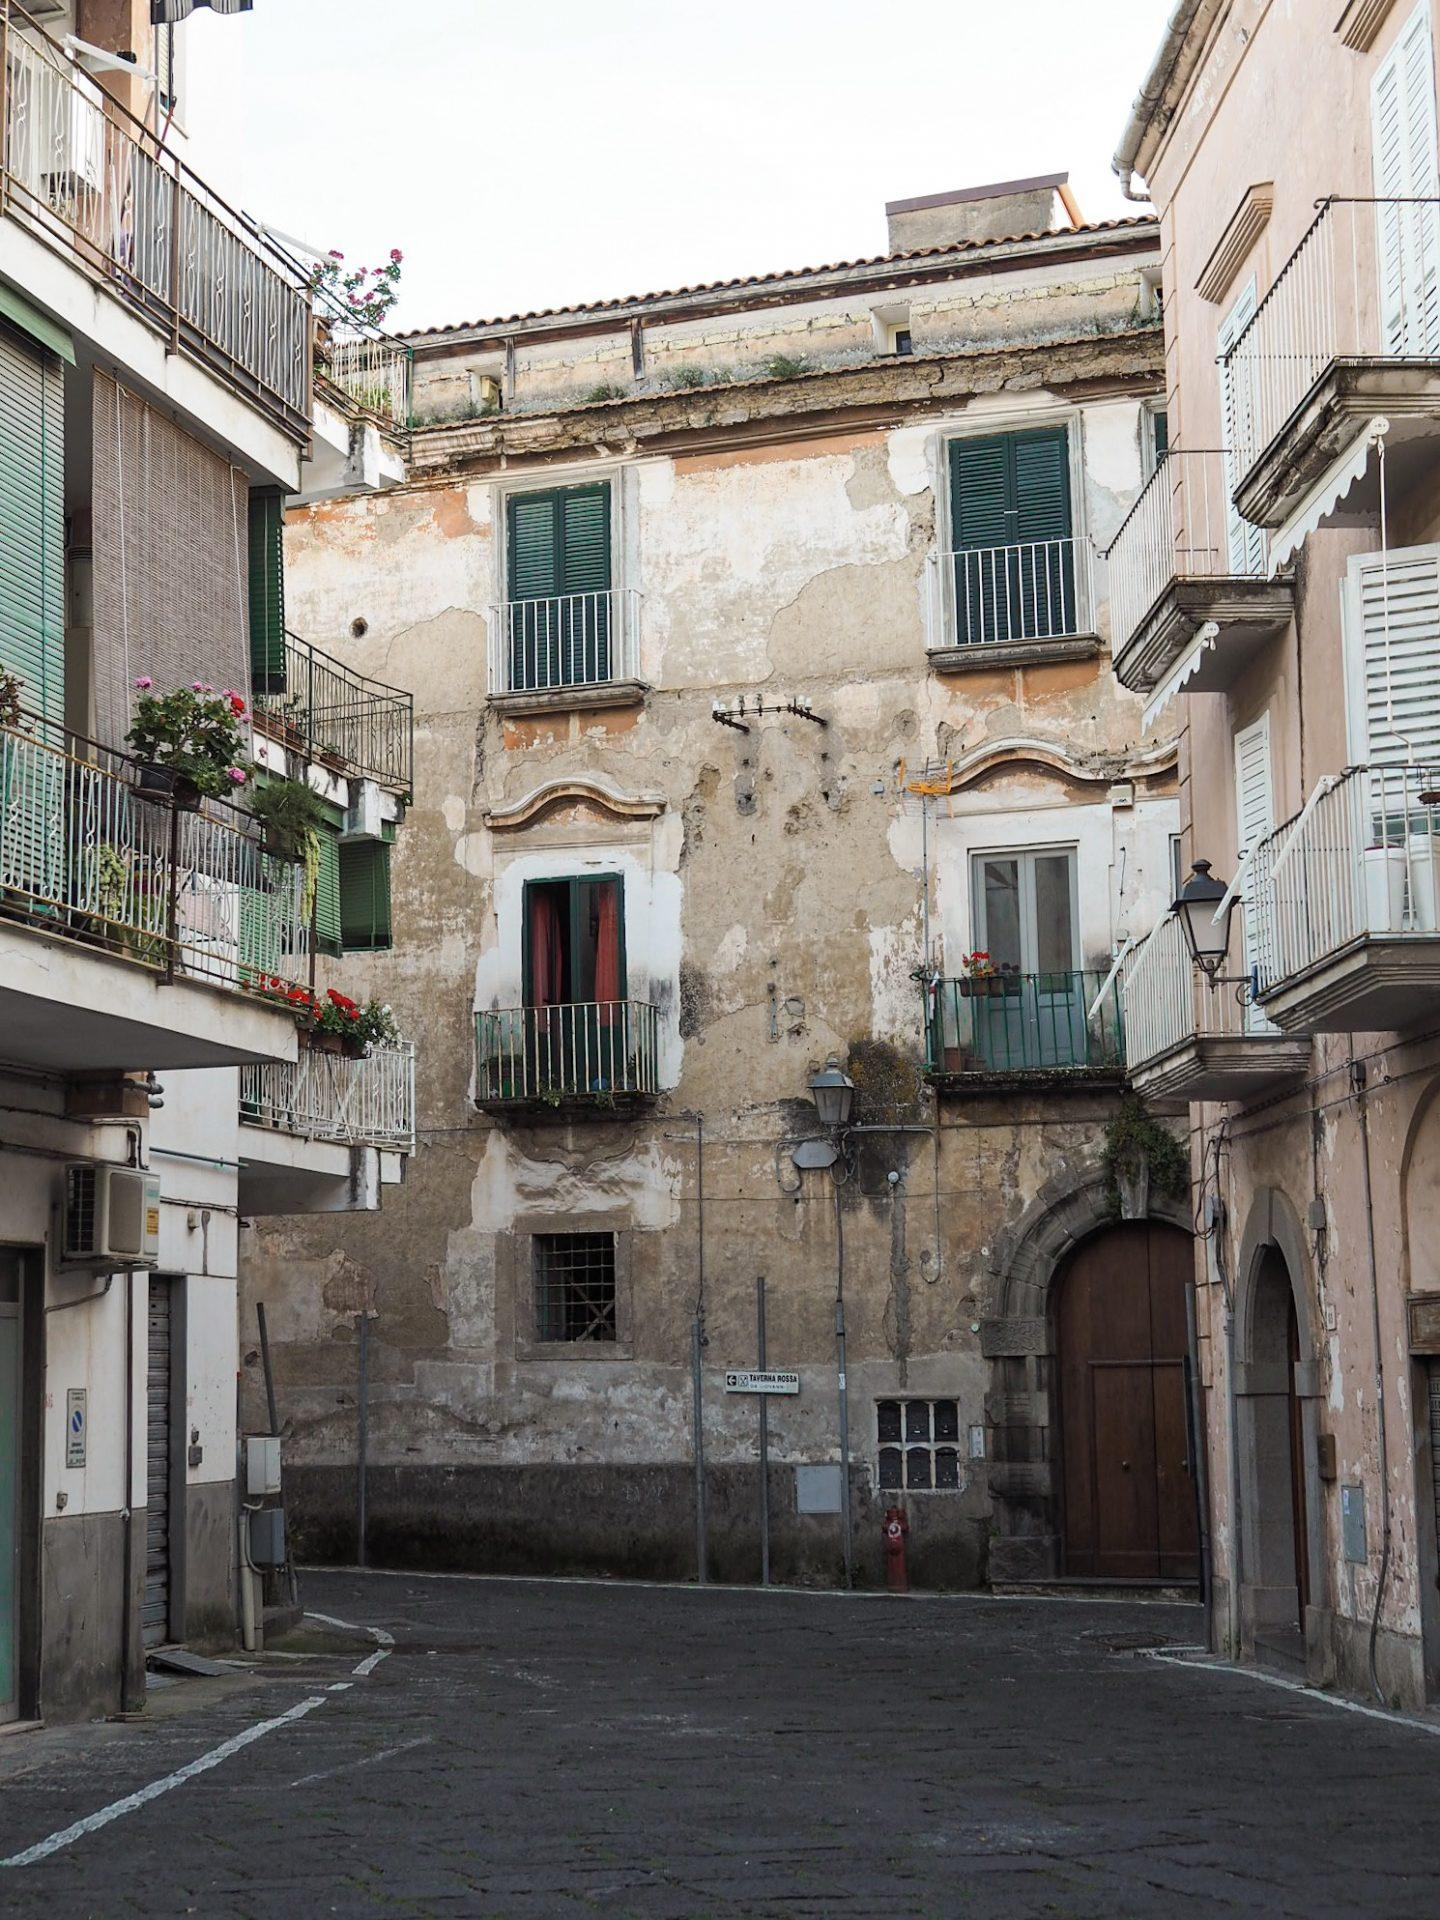 Sorrento back street